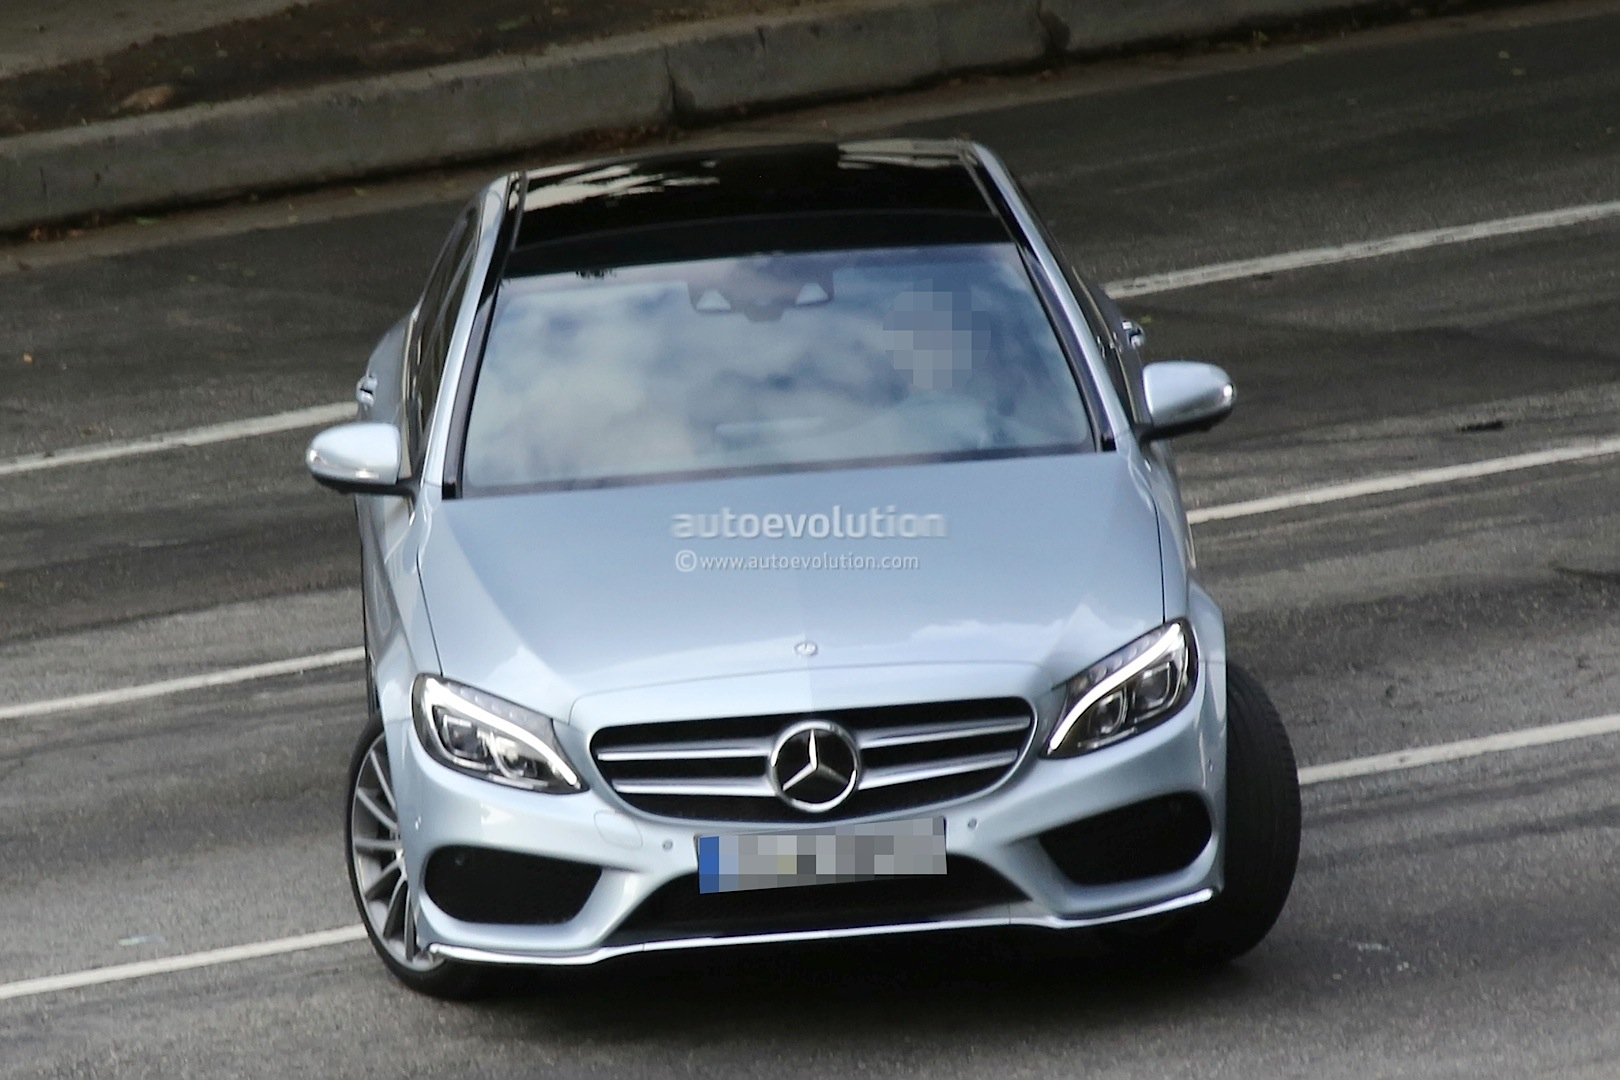 2015 mercedes benz c 200 w205 versus 2014 c 200 w204 for Mercedes benz w205